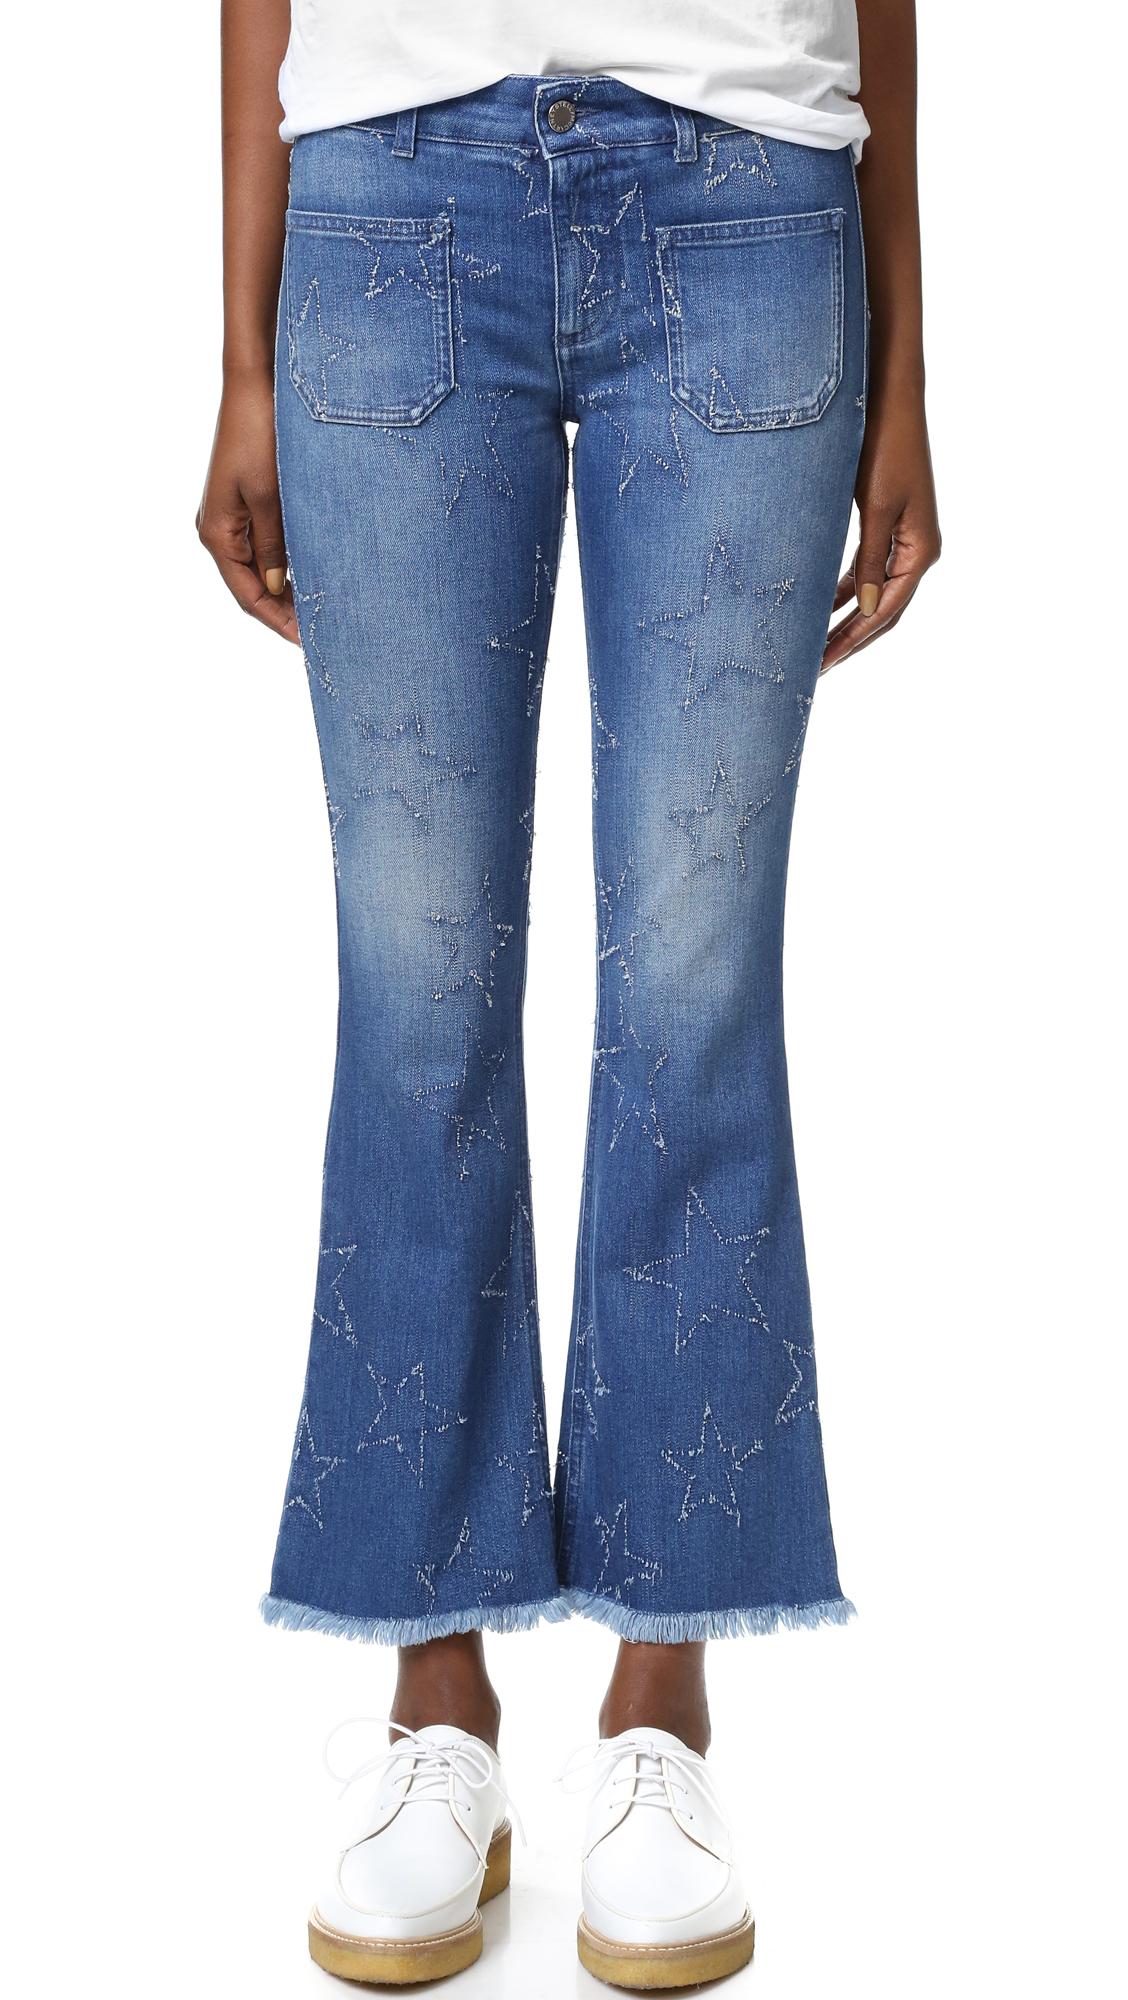 Stella McCartney Skinny Kick Jeans - Deep Blue